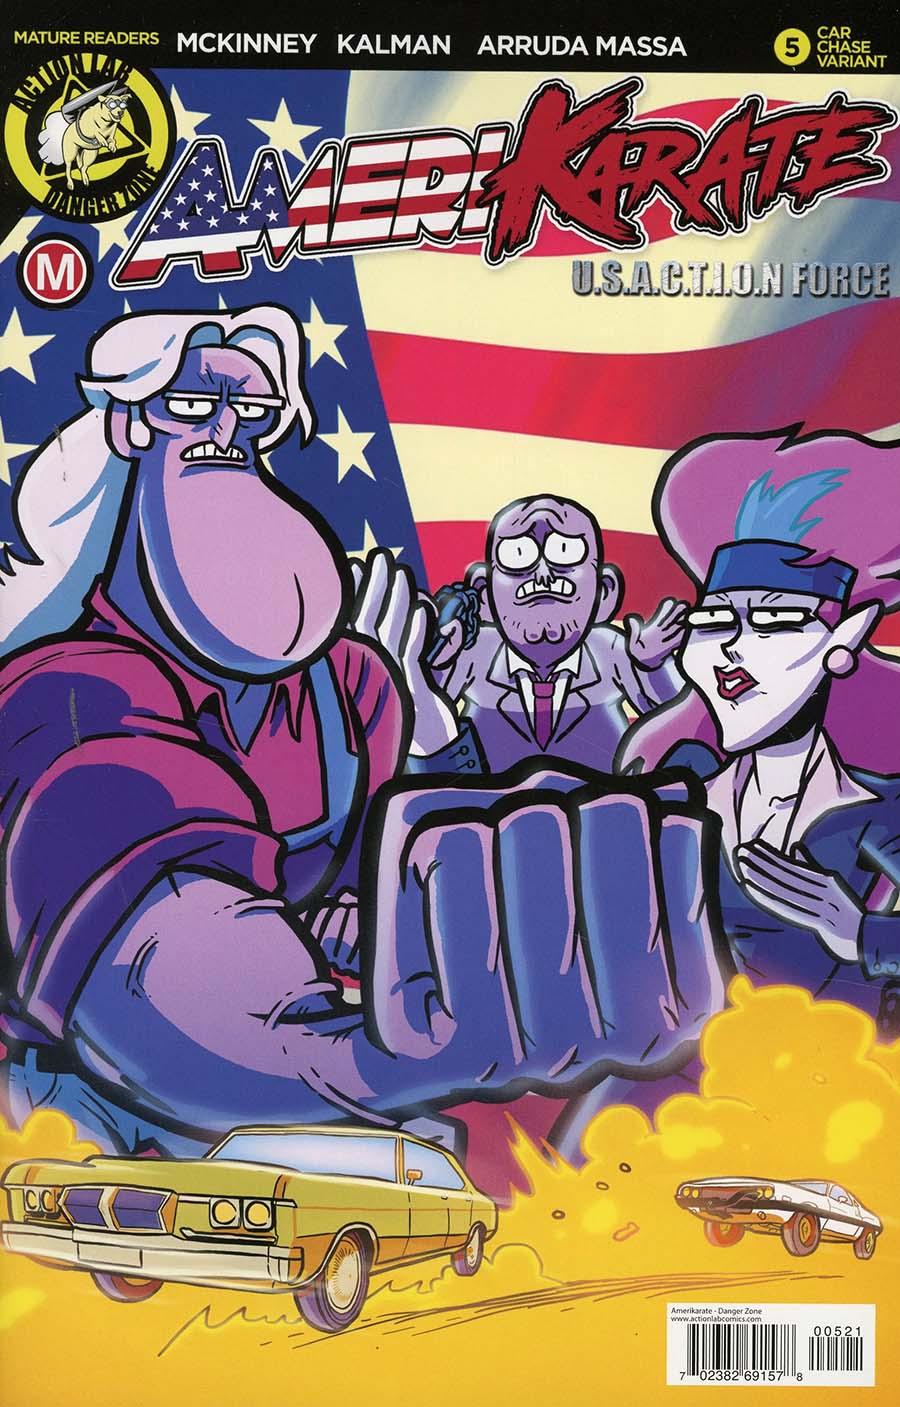 Amerikarate #5 Cover B Variant Daniel Arruda Massa Movie Cover